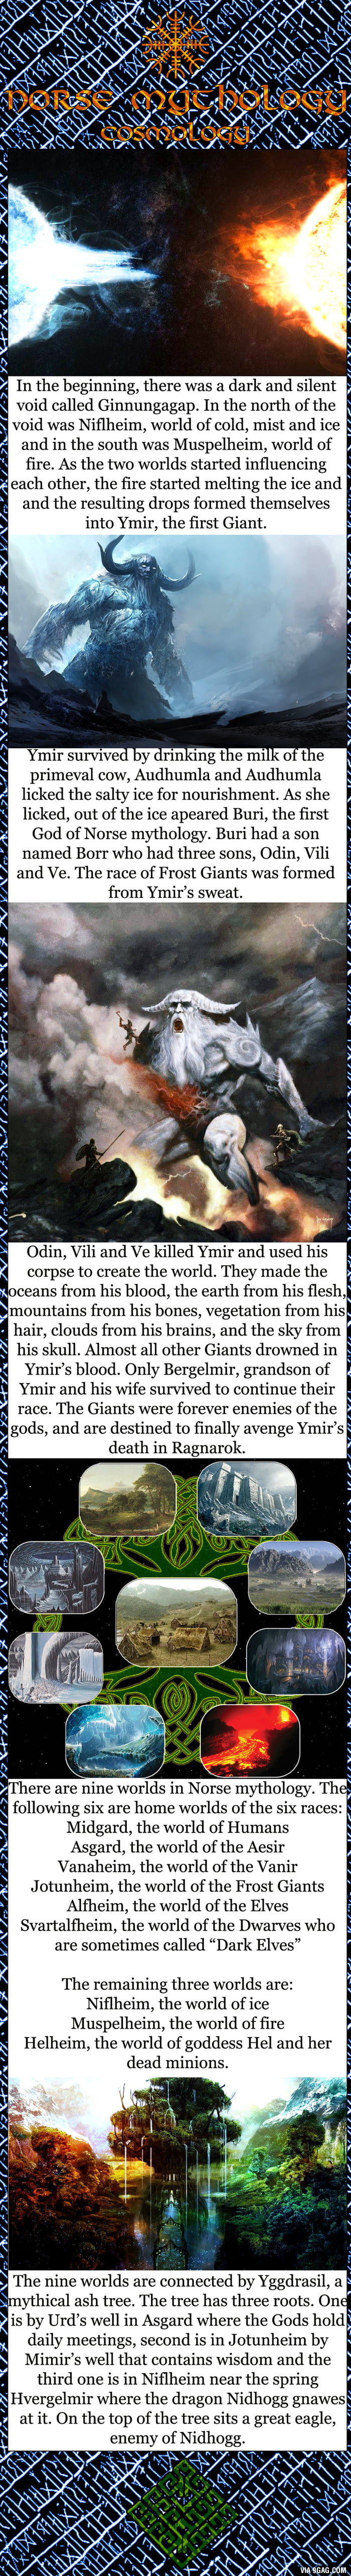 Memes Odin Ice Giants Wwwtollebildcom